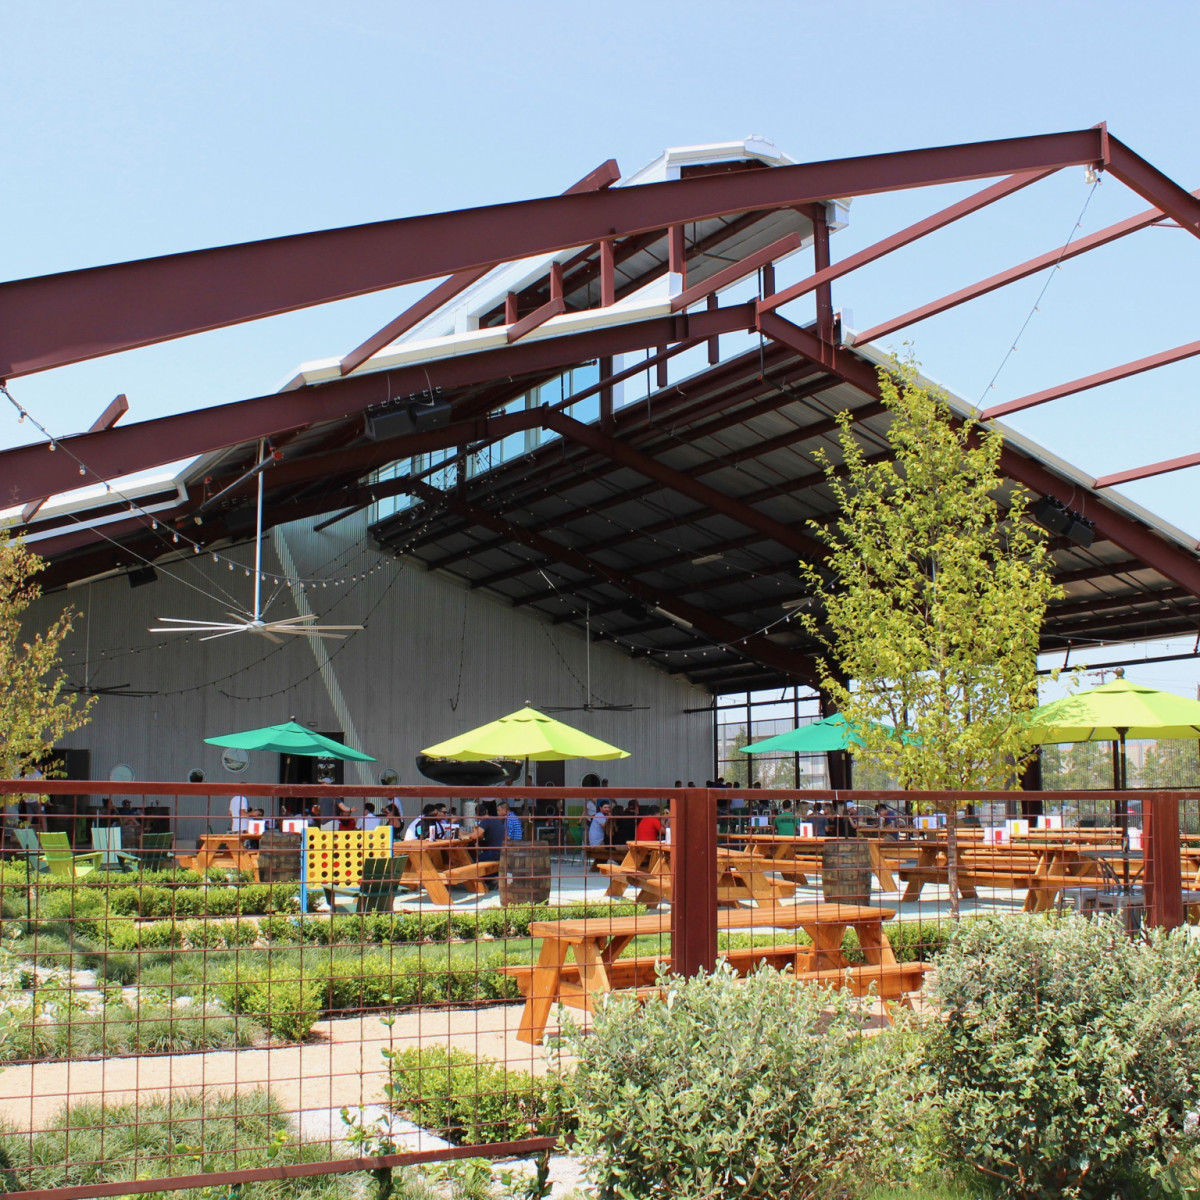 Saint Arnold beer garden exterior